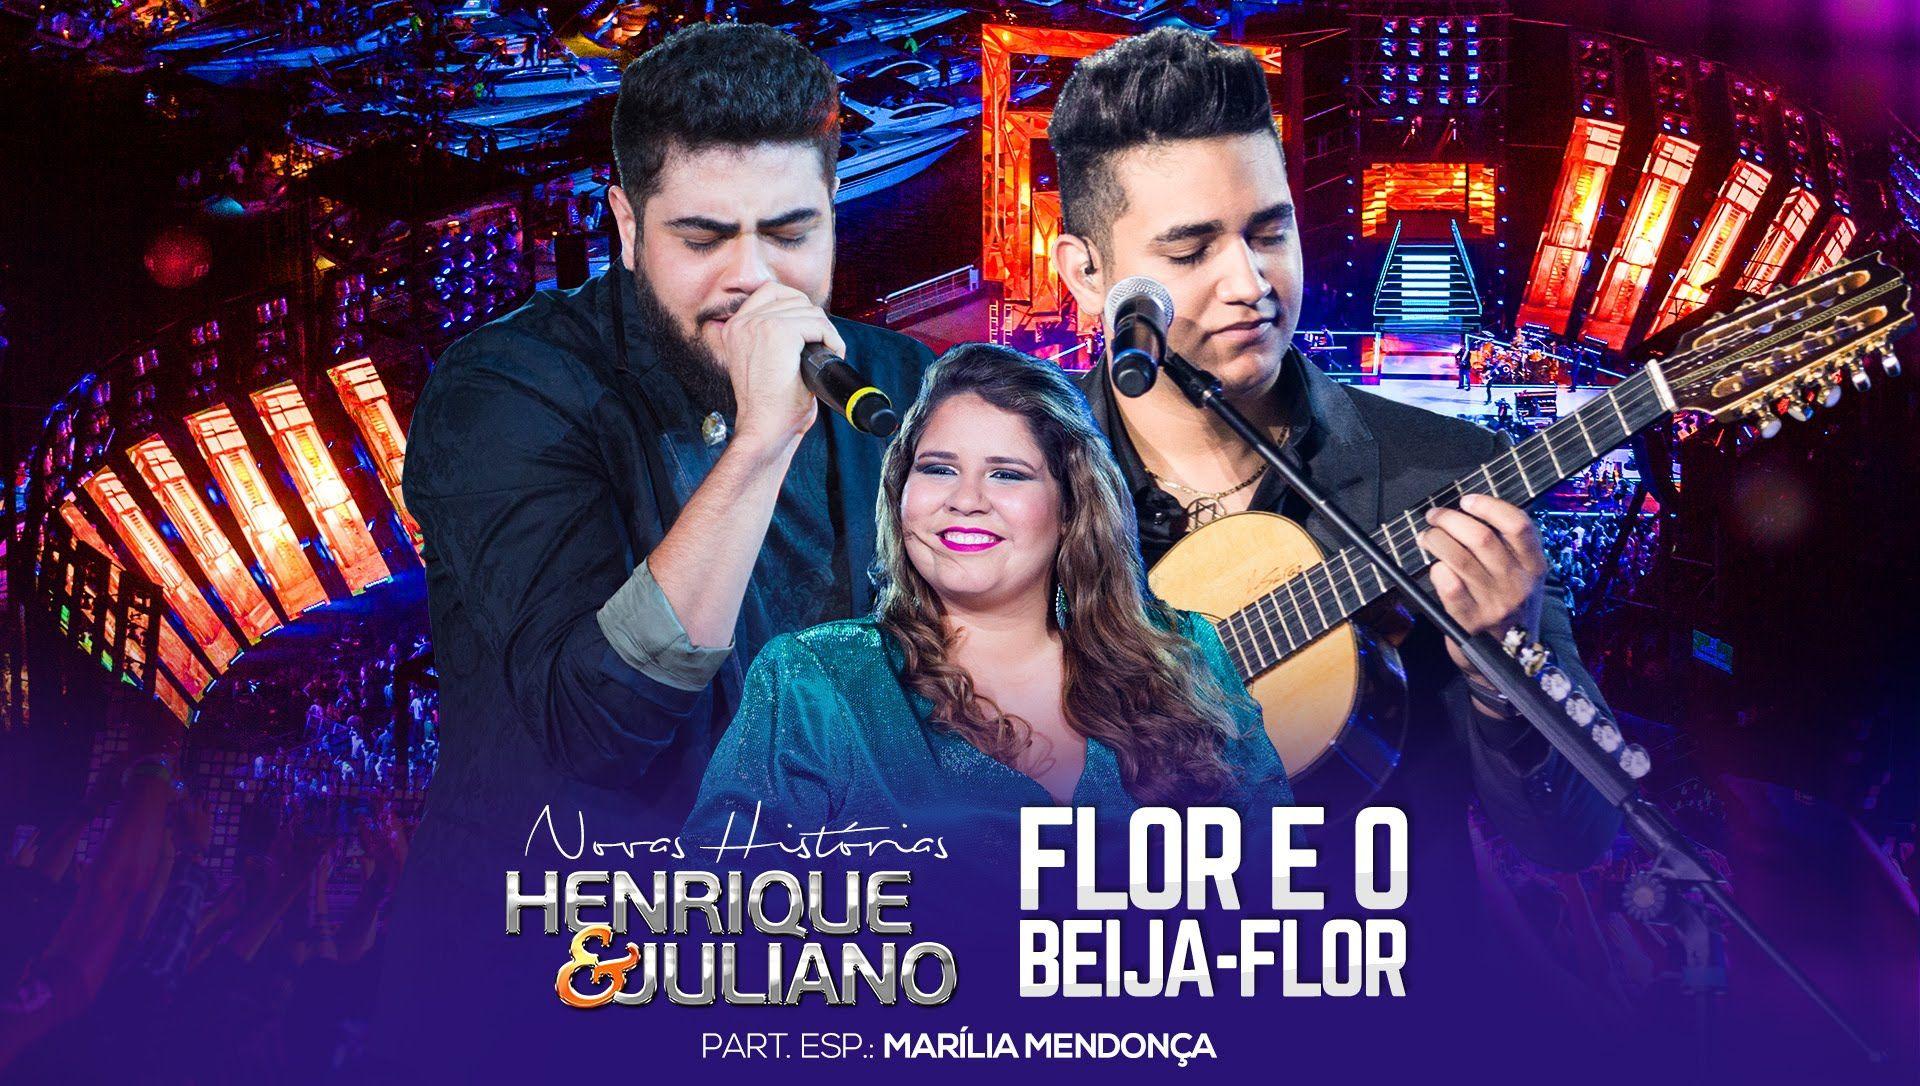 Henrique E Juliano Flor E O Beija Flor Part Marilia Mendonca